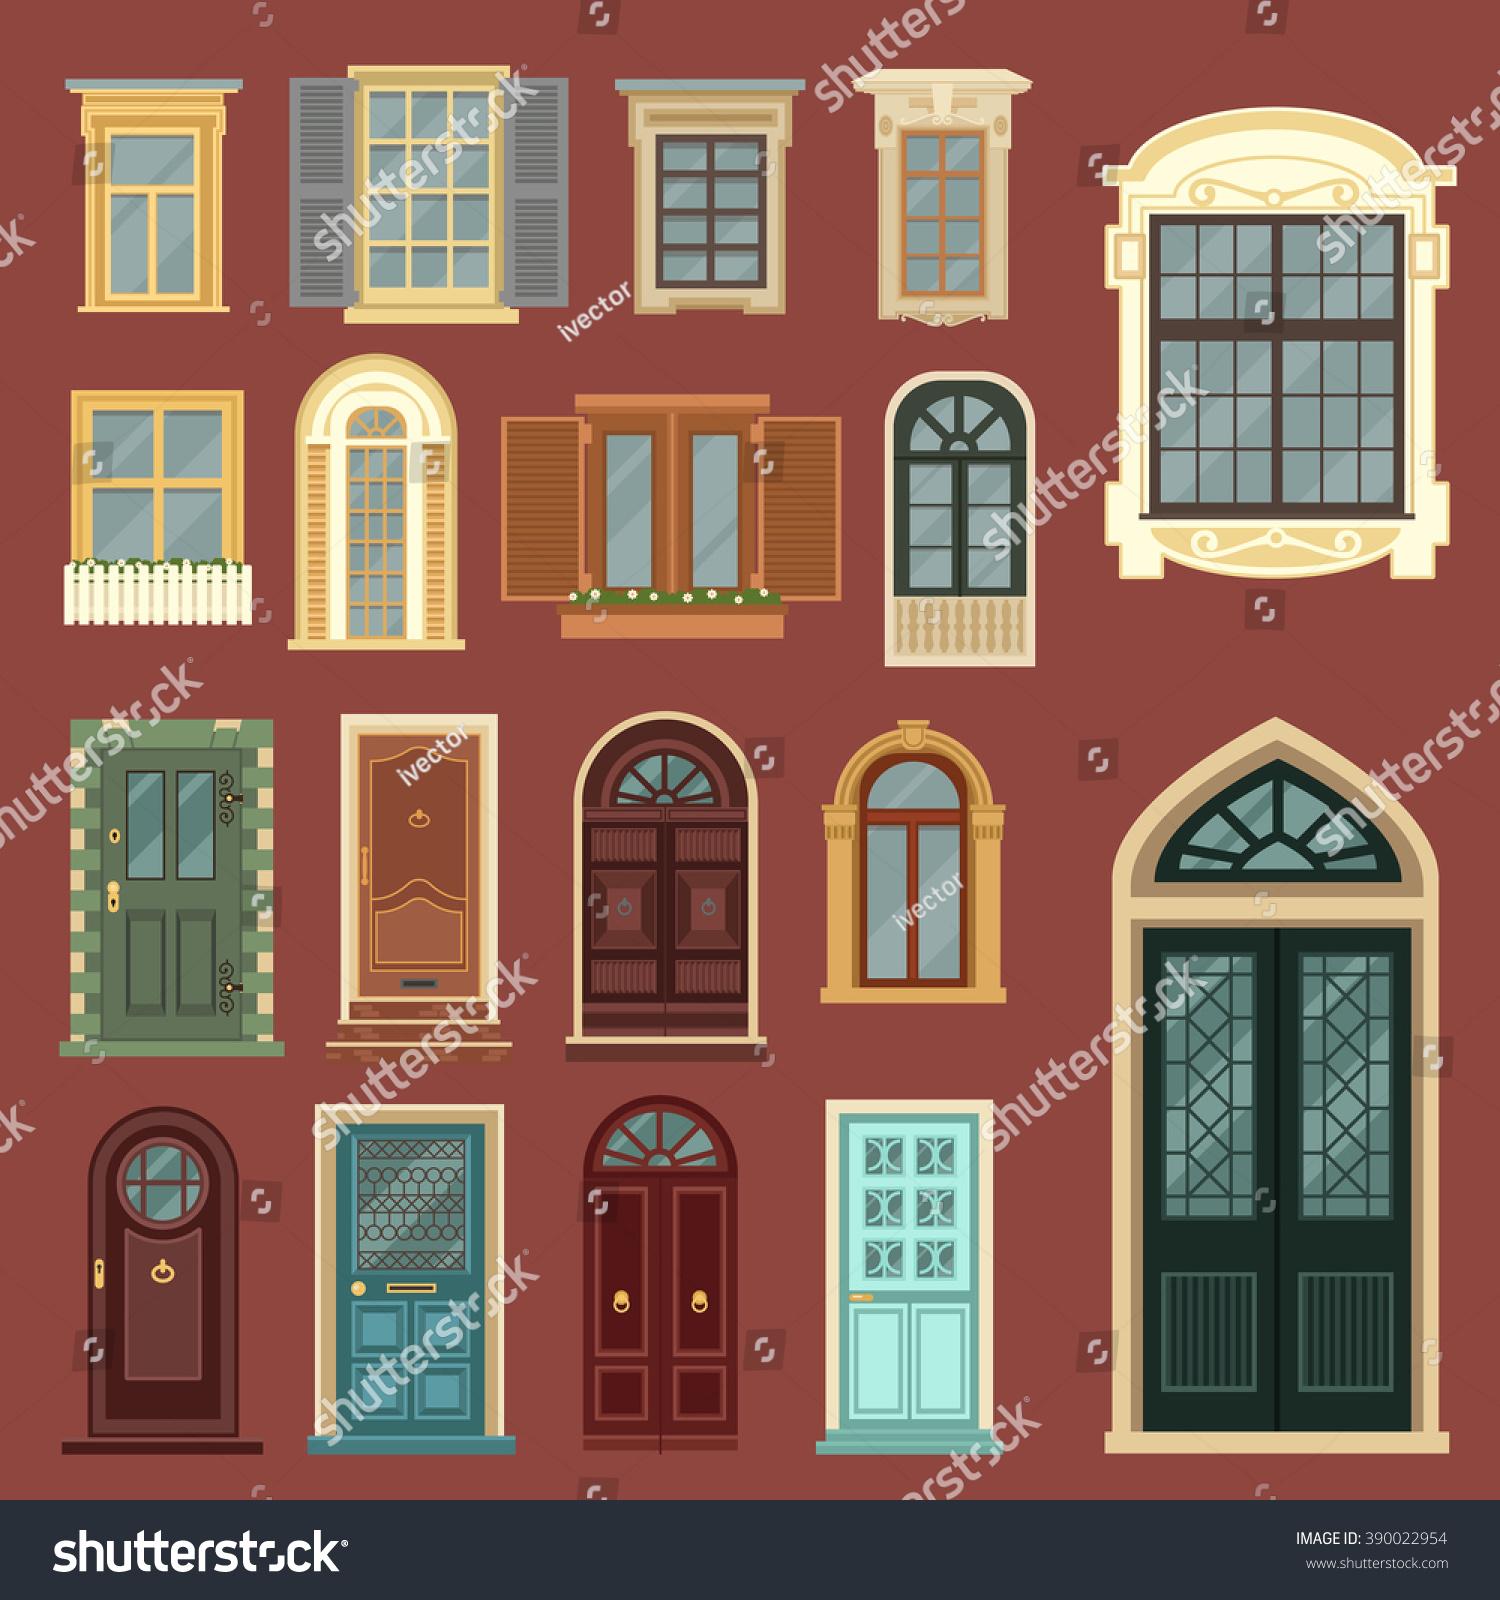 Vintage Doors Detailed Windows European Architecture Stock Vector - Building architectural windows